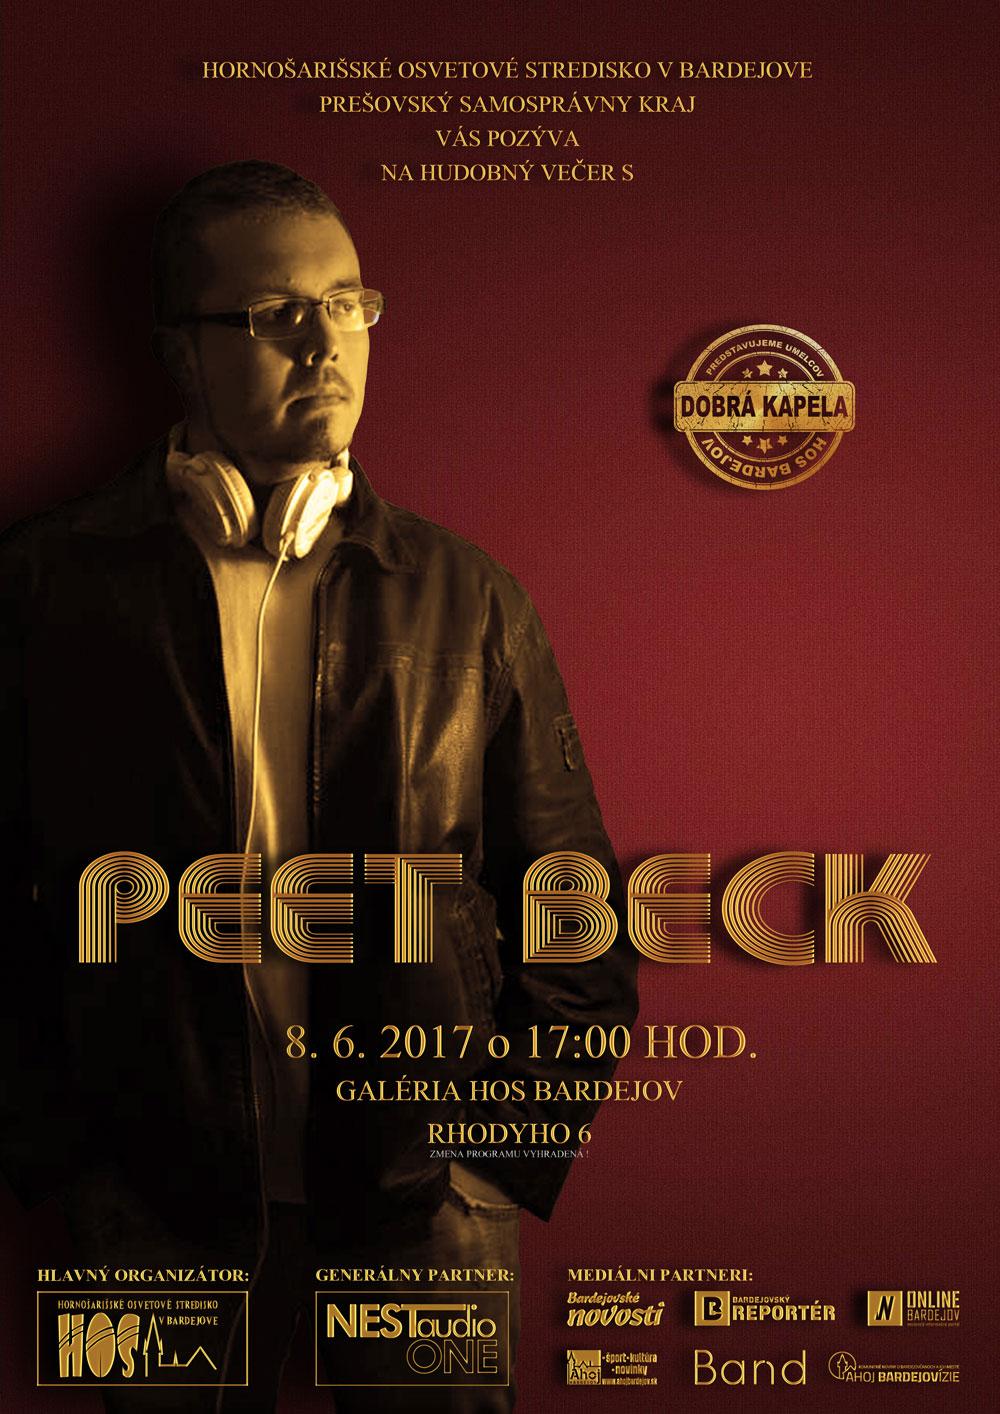 Peet Beck